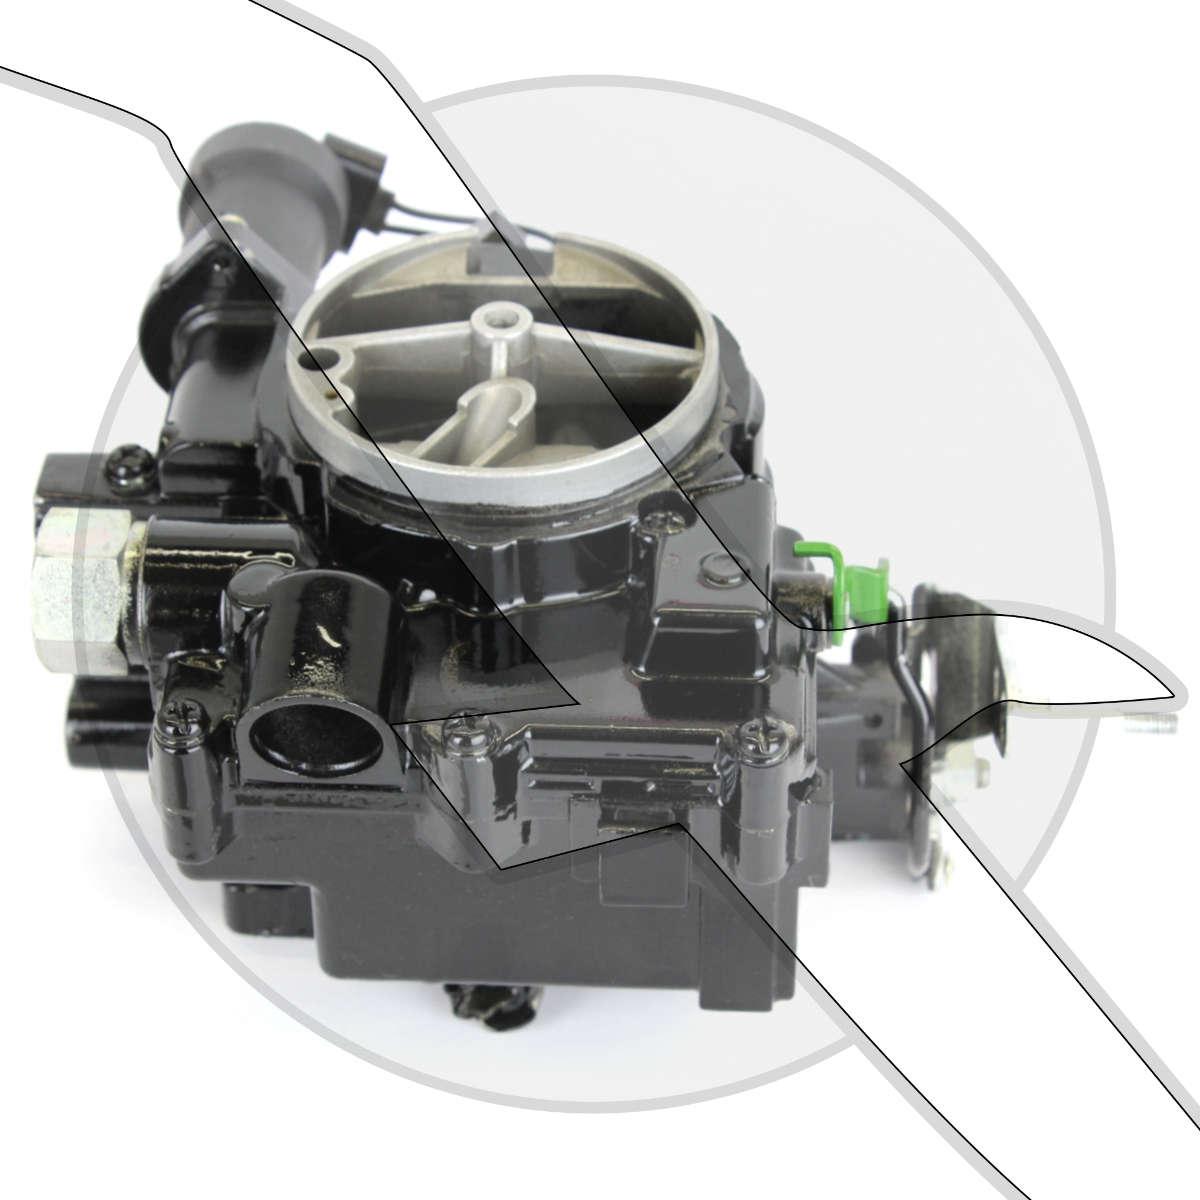 4.3L Mercruiser TKS Carburetor 3310-866141A02 3310-8M0084194 2bbl Marine Carb